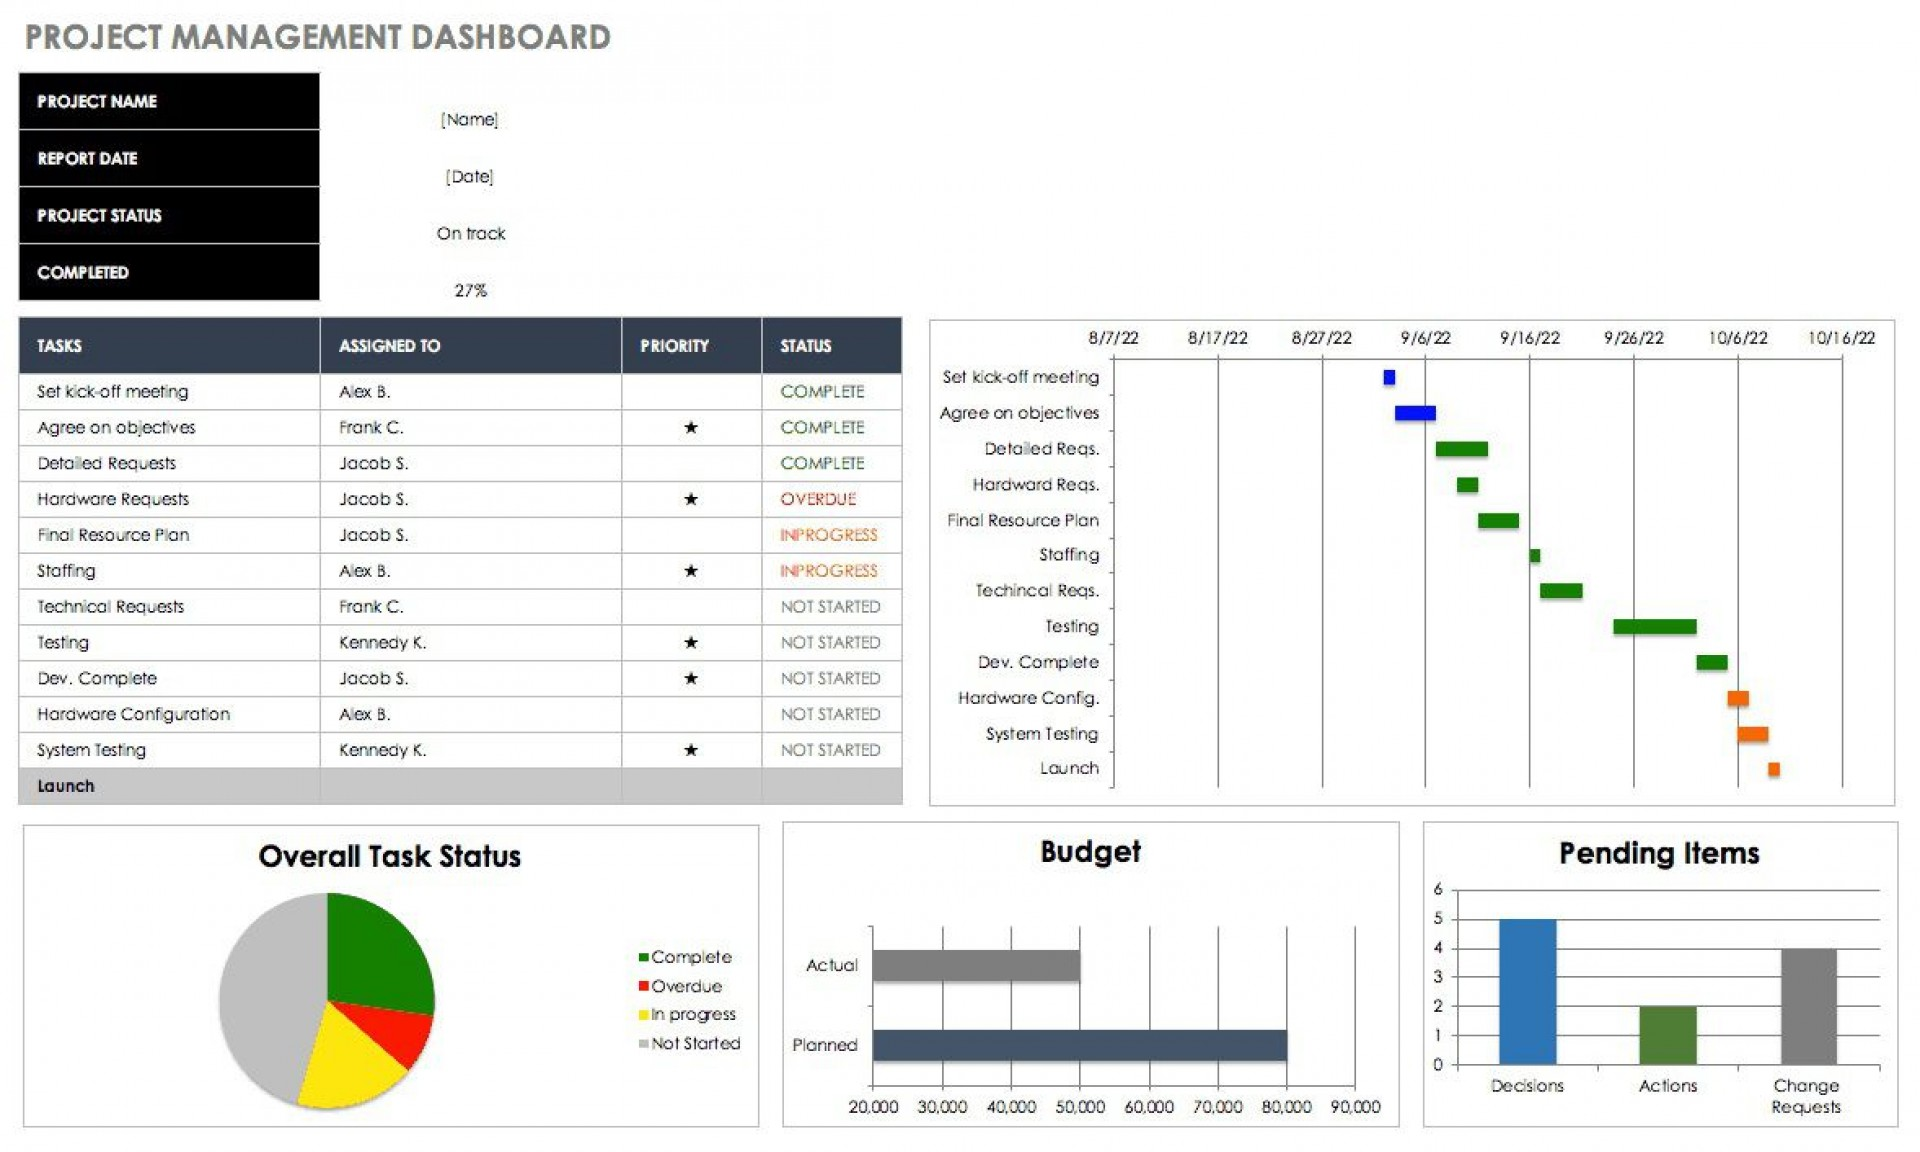 008 Amazing Excel Dashboard Template Free High Def  Sale Logistic Kpi Download Procurement1920